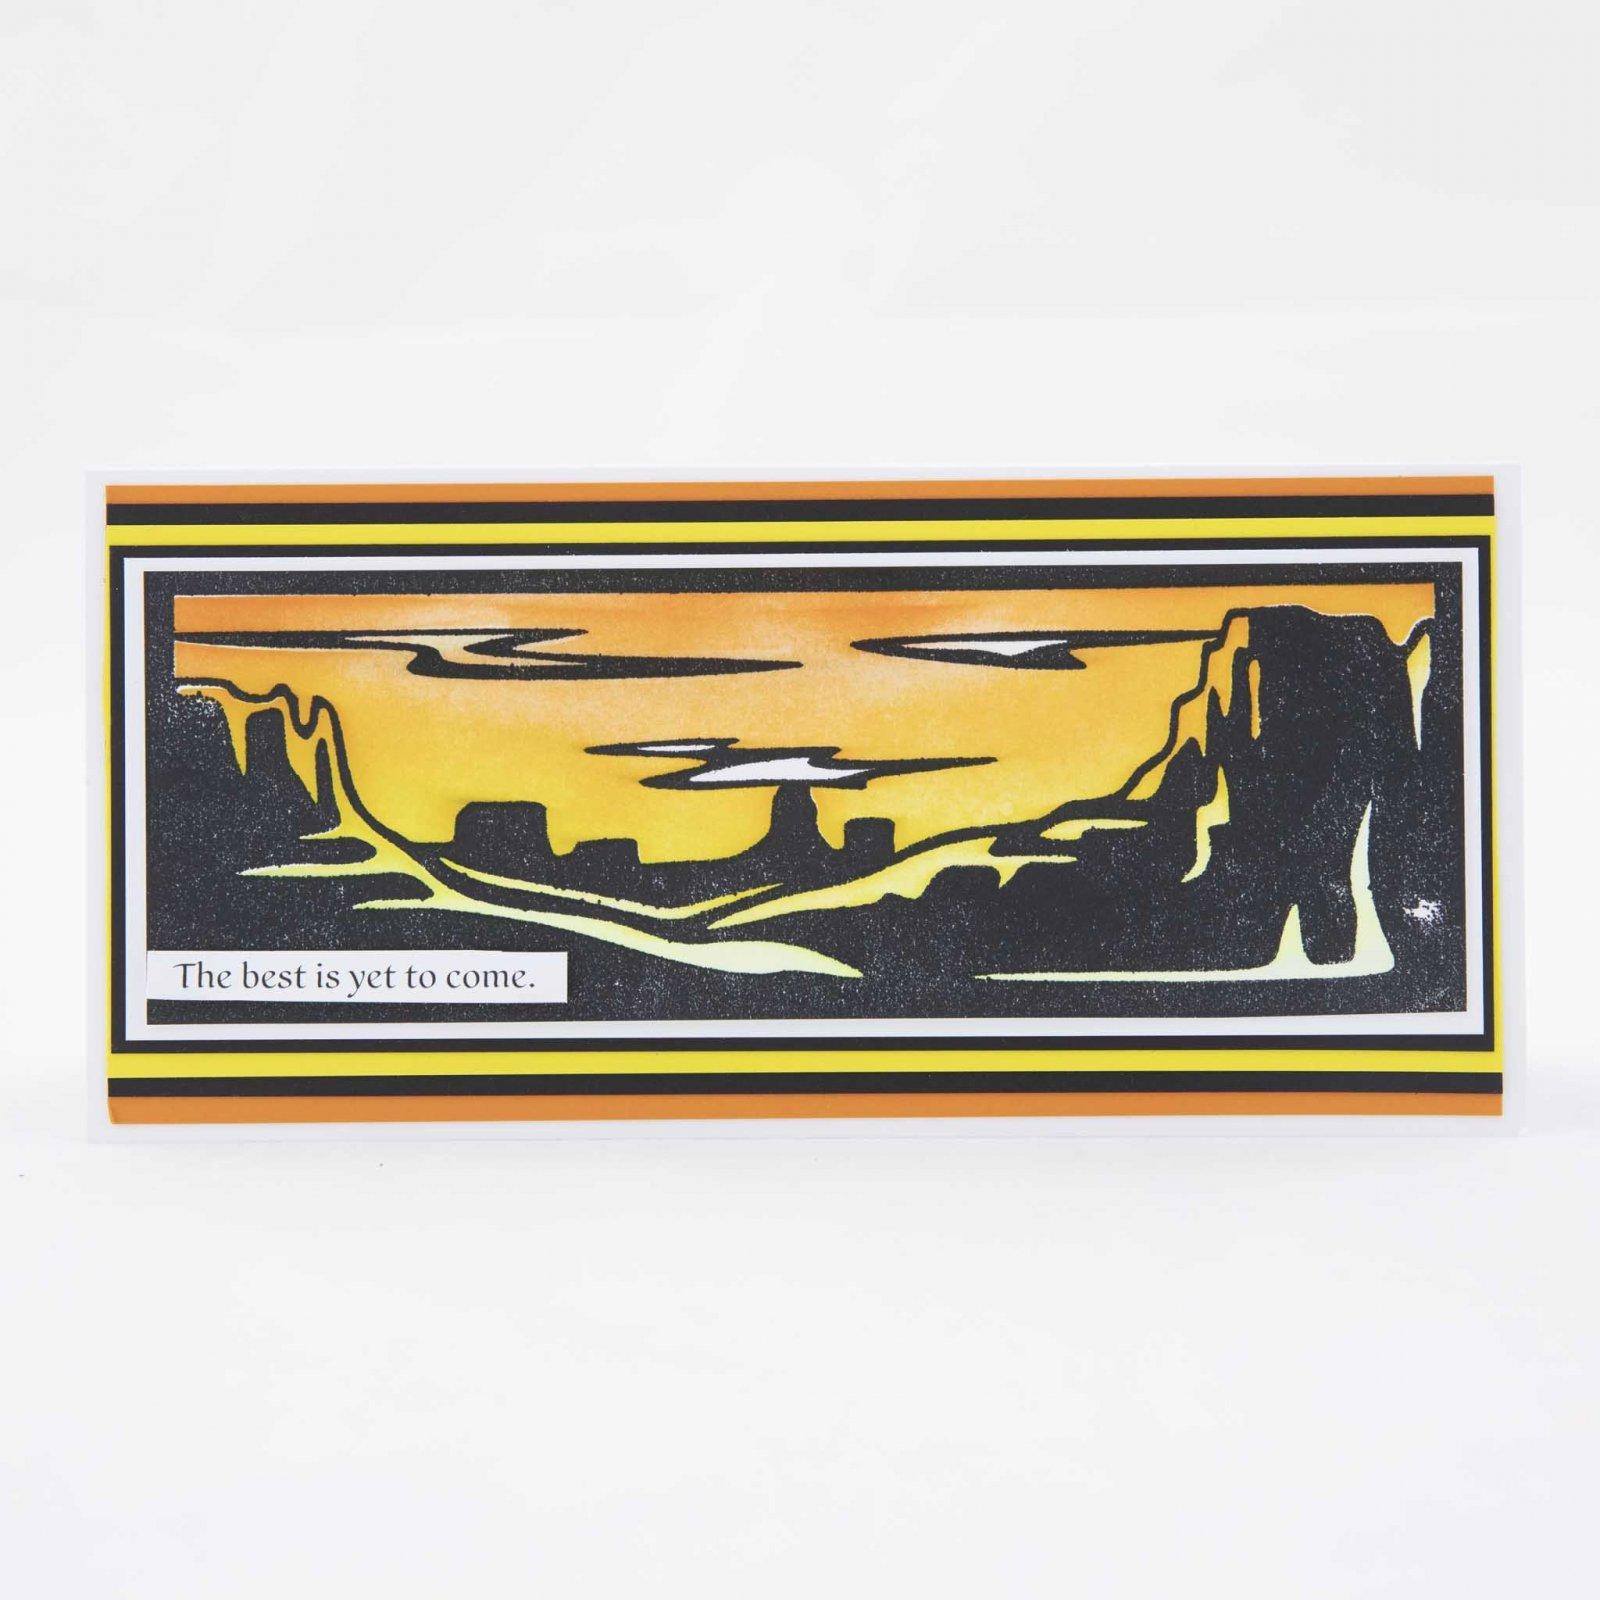 Grand Canyon Slimline-Maker Forte Stamp & Stencil By Hedgehog Hollow 3.25X8